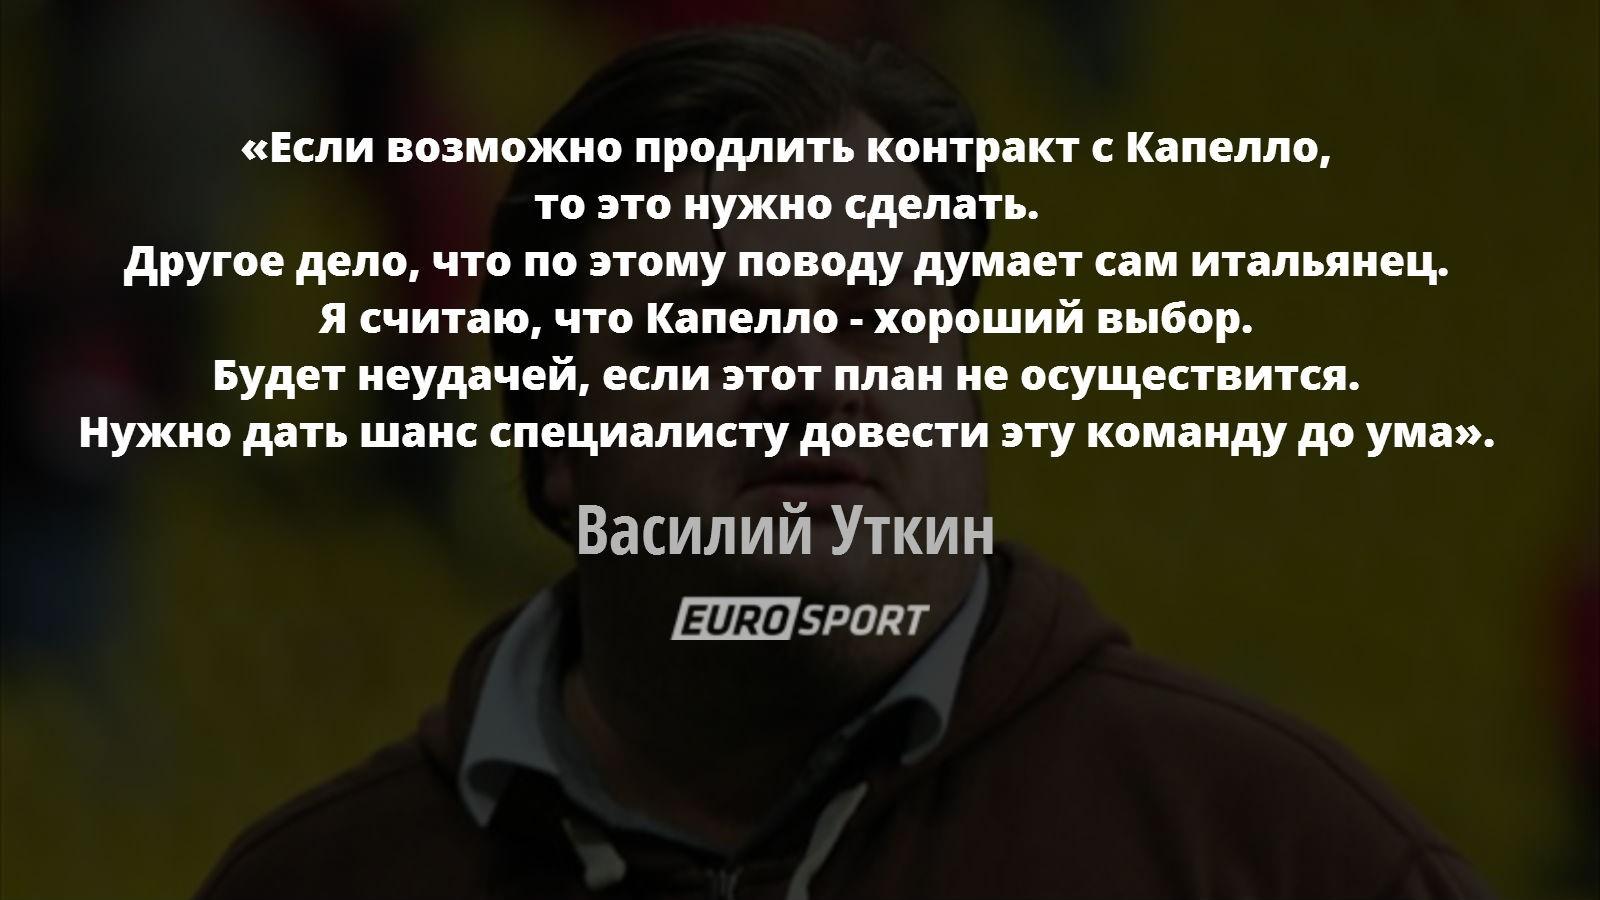 https://i.eurosport.com/2015/07/13/1639180.jpg